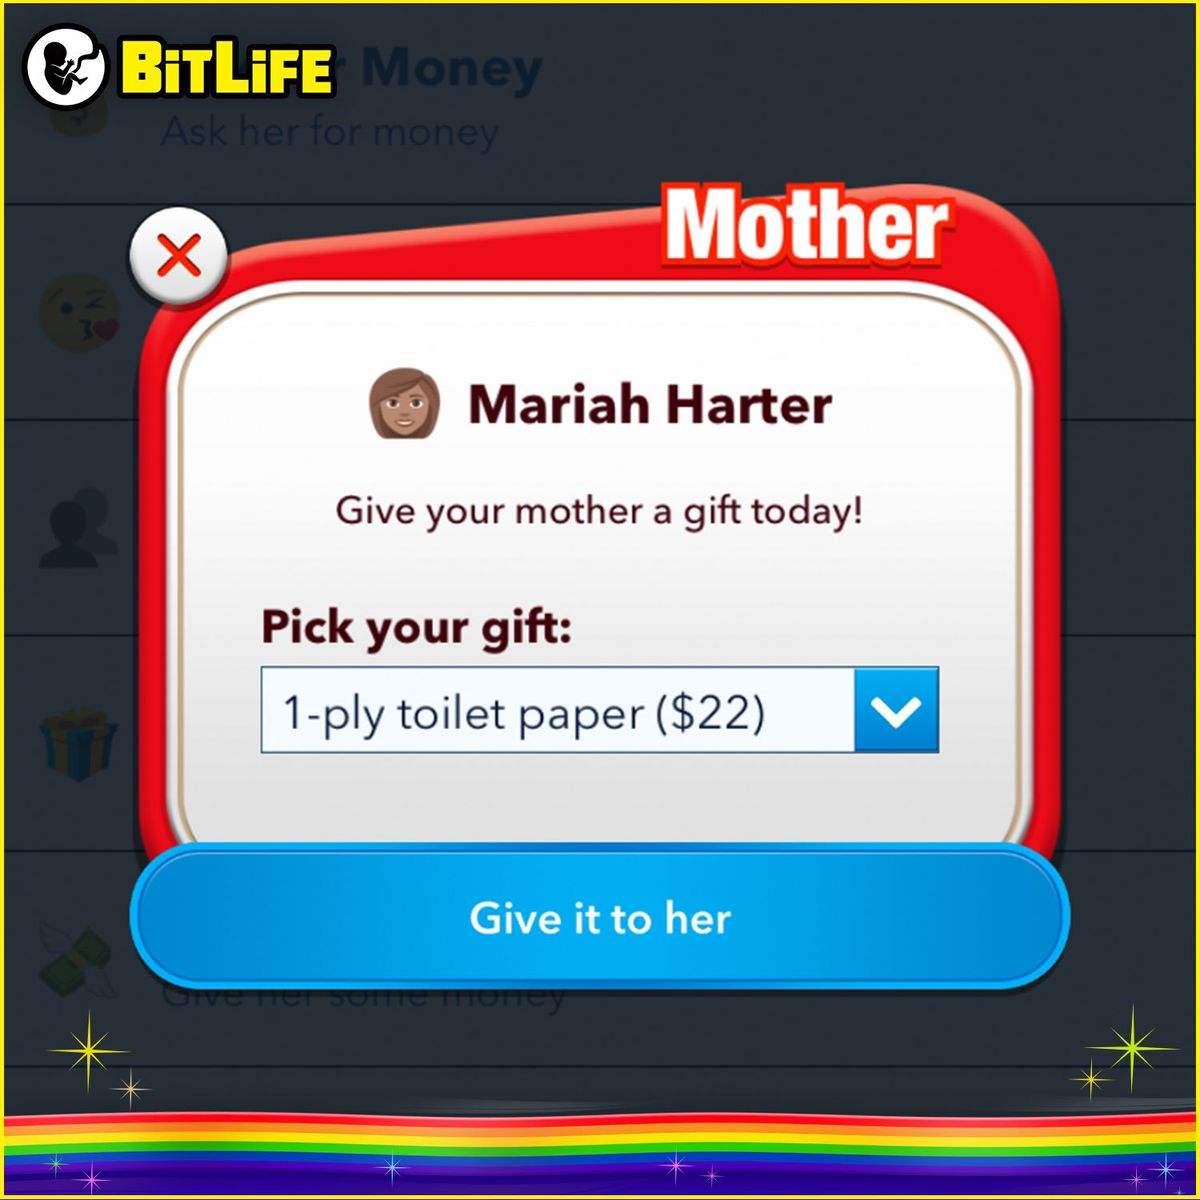 A screenshot from BitLife.